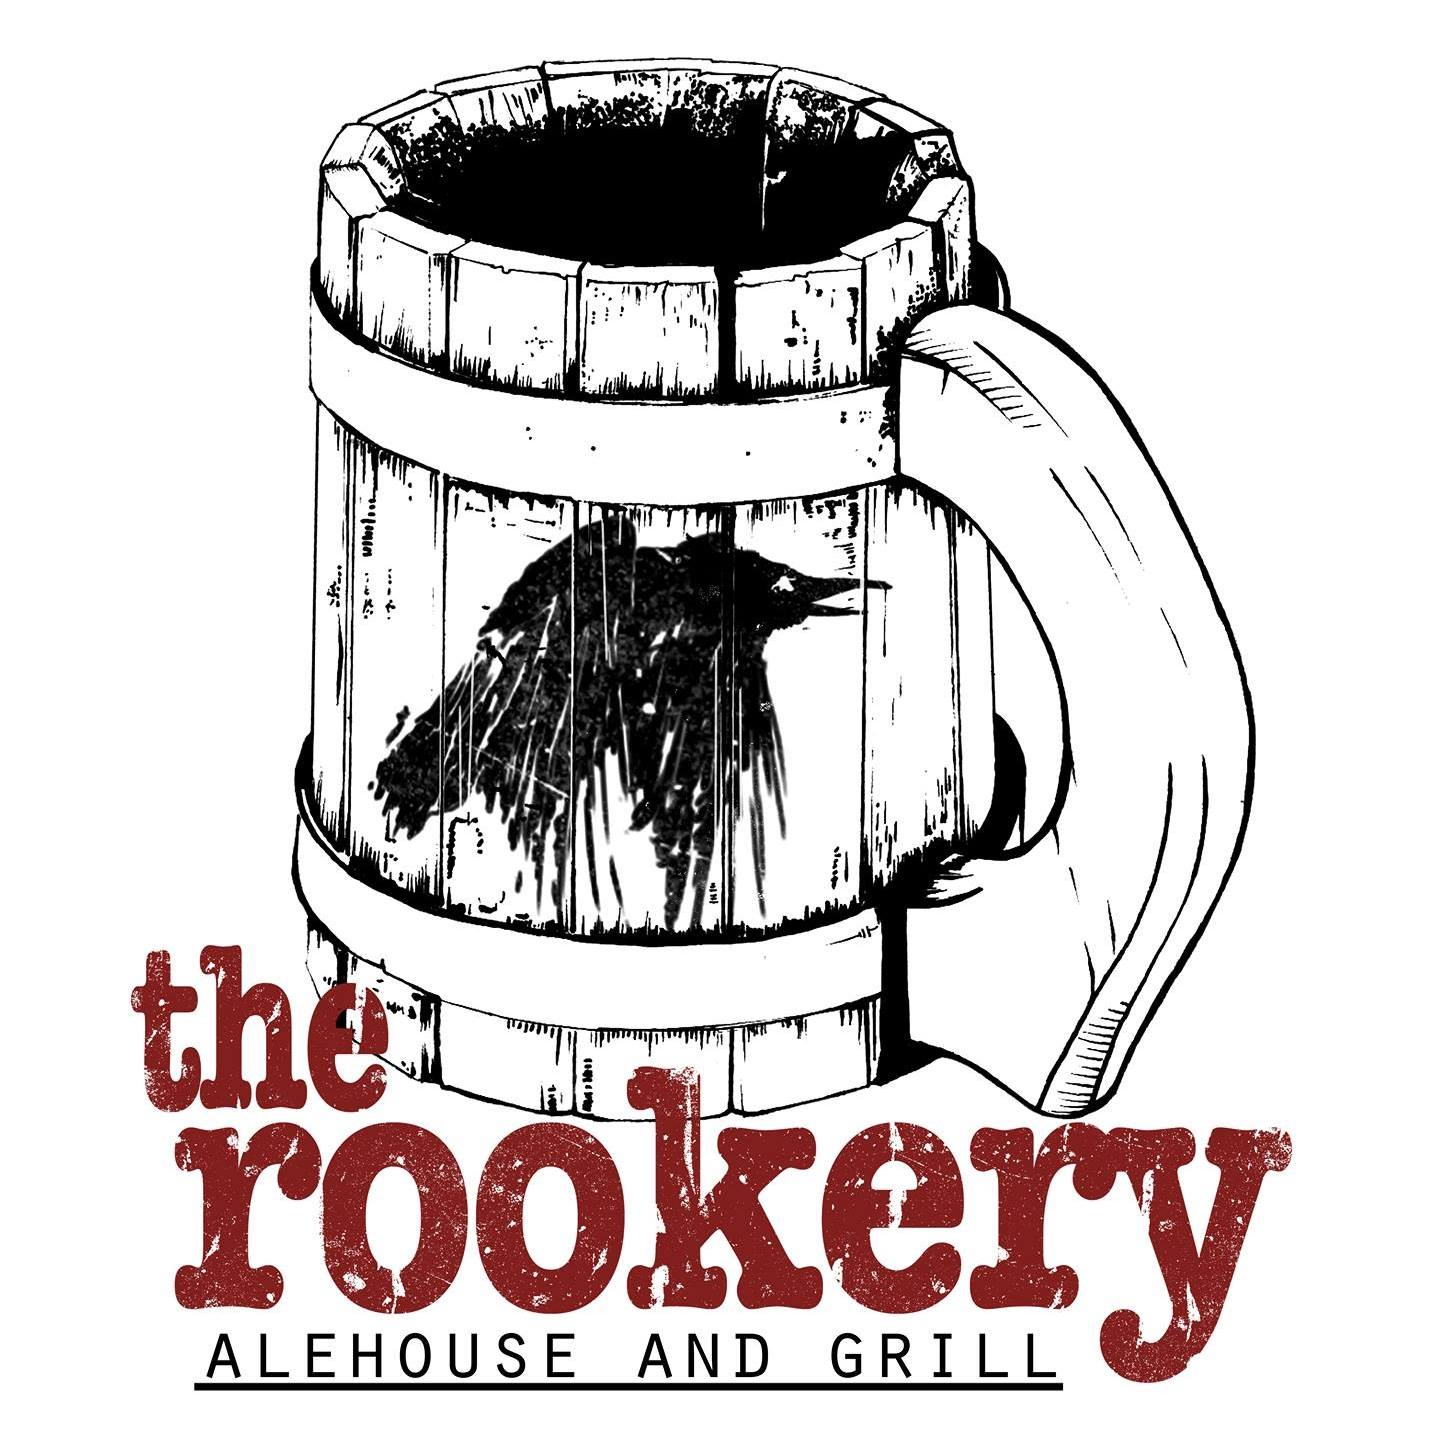 Rookery Alehouse